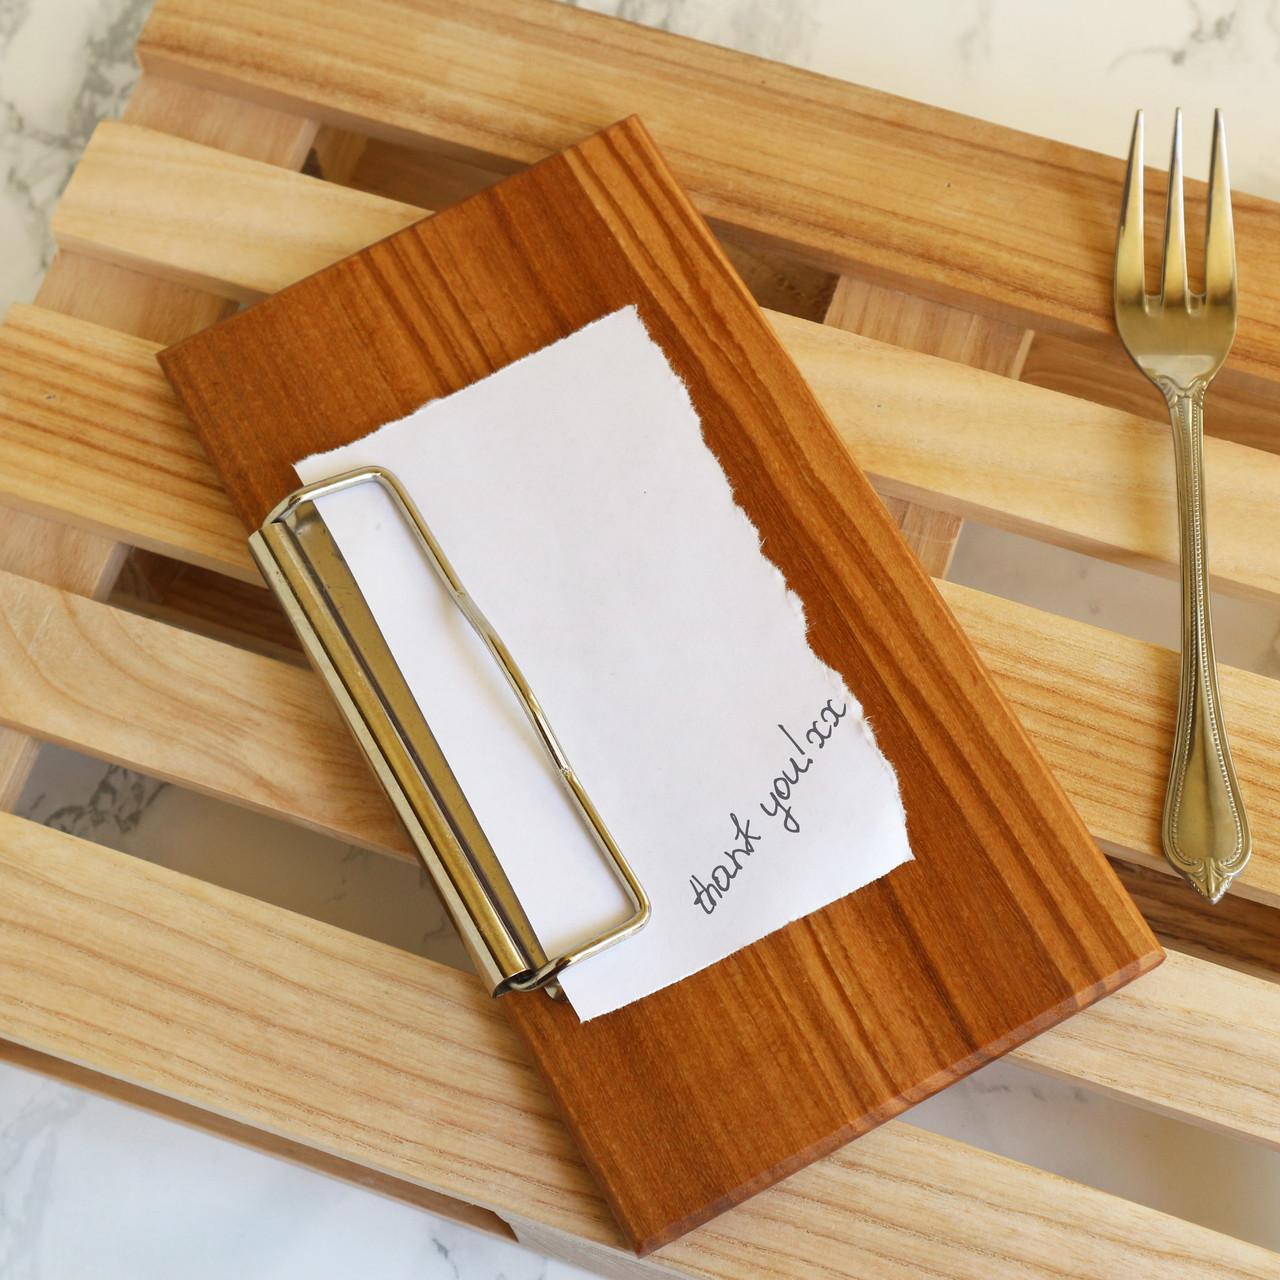 Чекбук с зажимом деревянный  Берест/Черешня LAS 177 х  97 х 10h мм